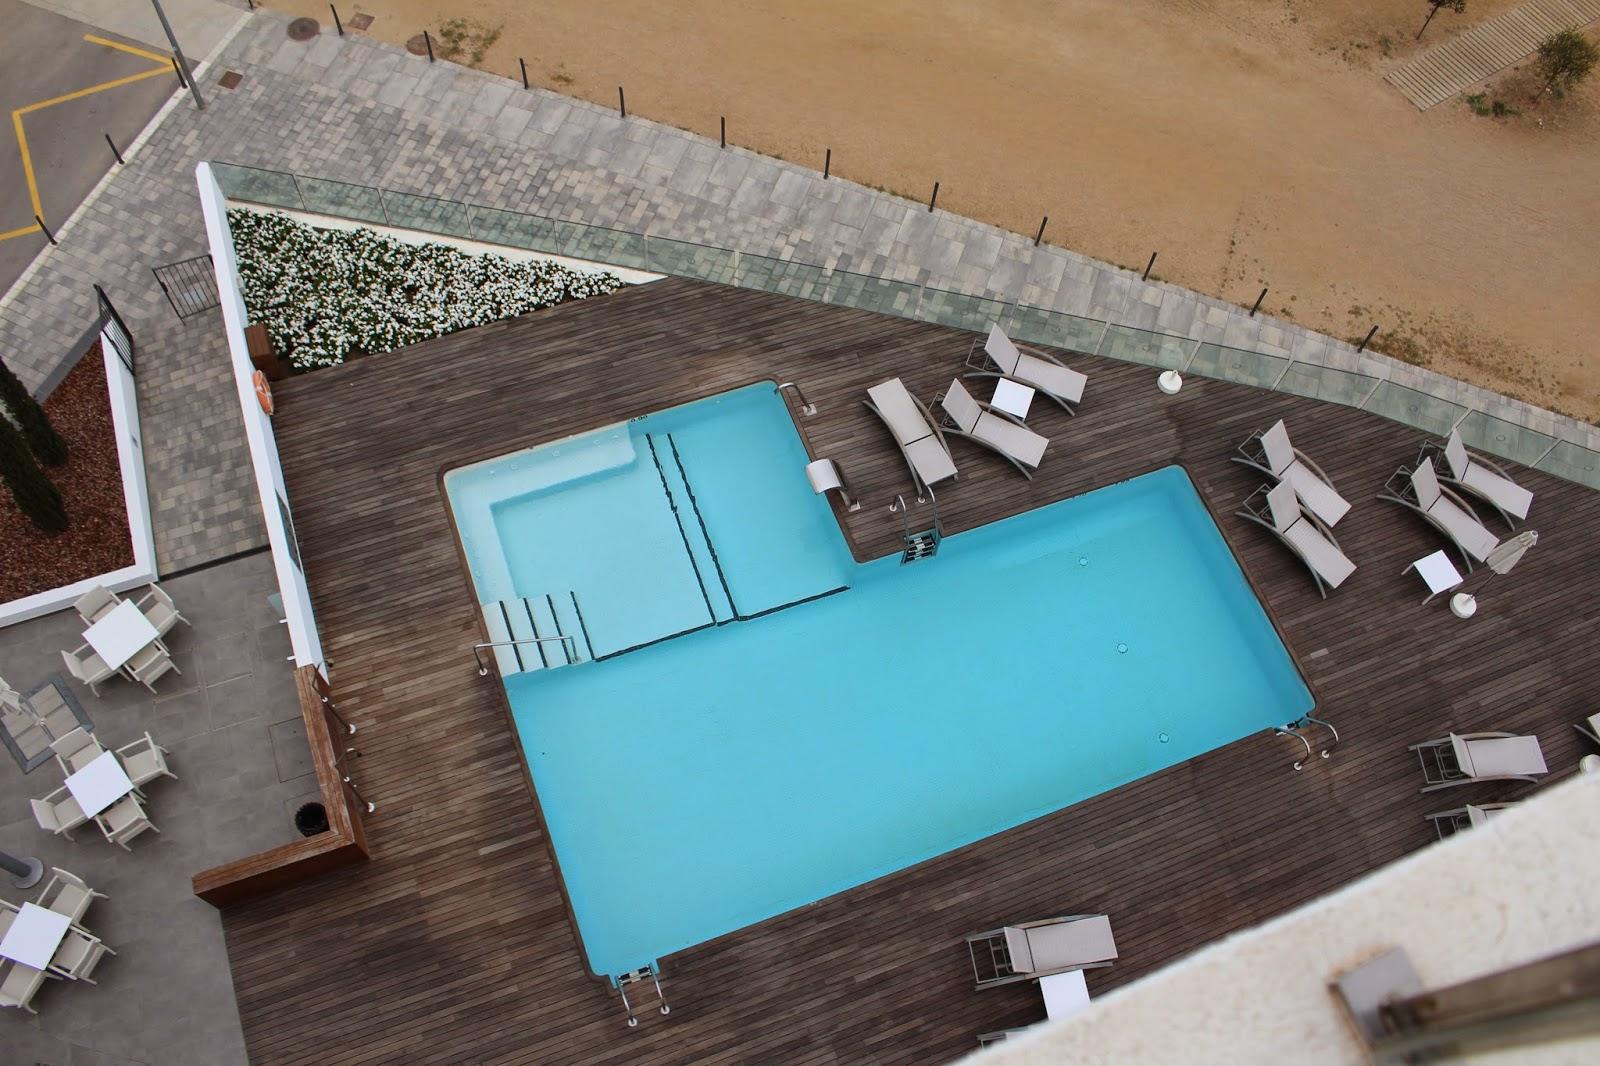 Fergus Hotel Mar Mediterrania Santa Susanna Spain pool